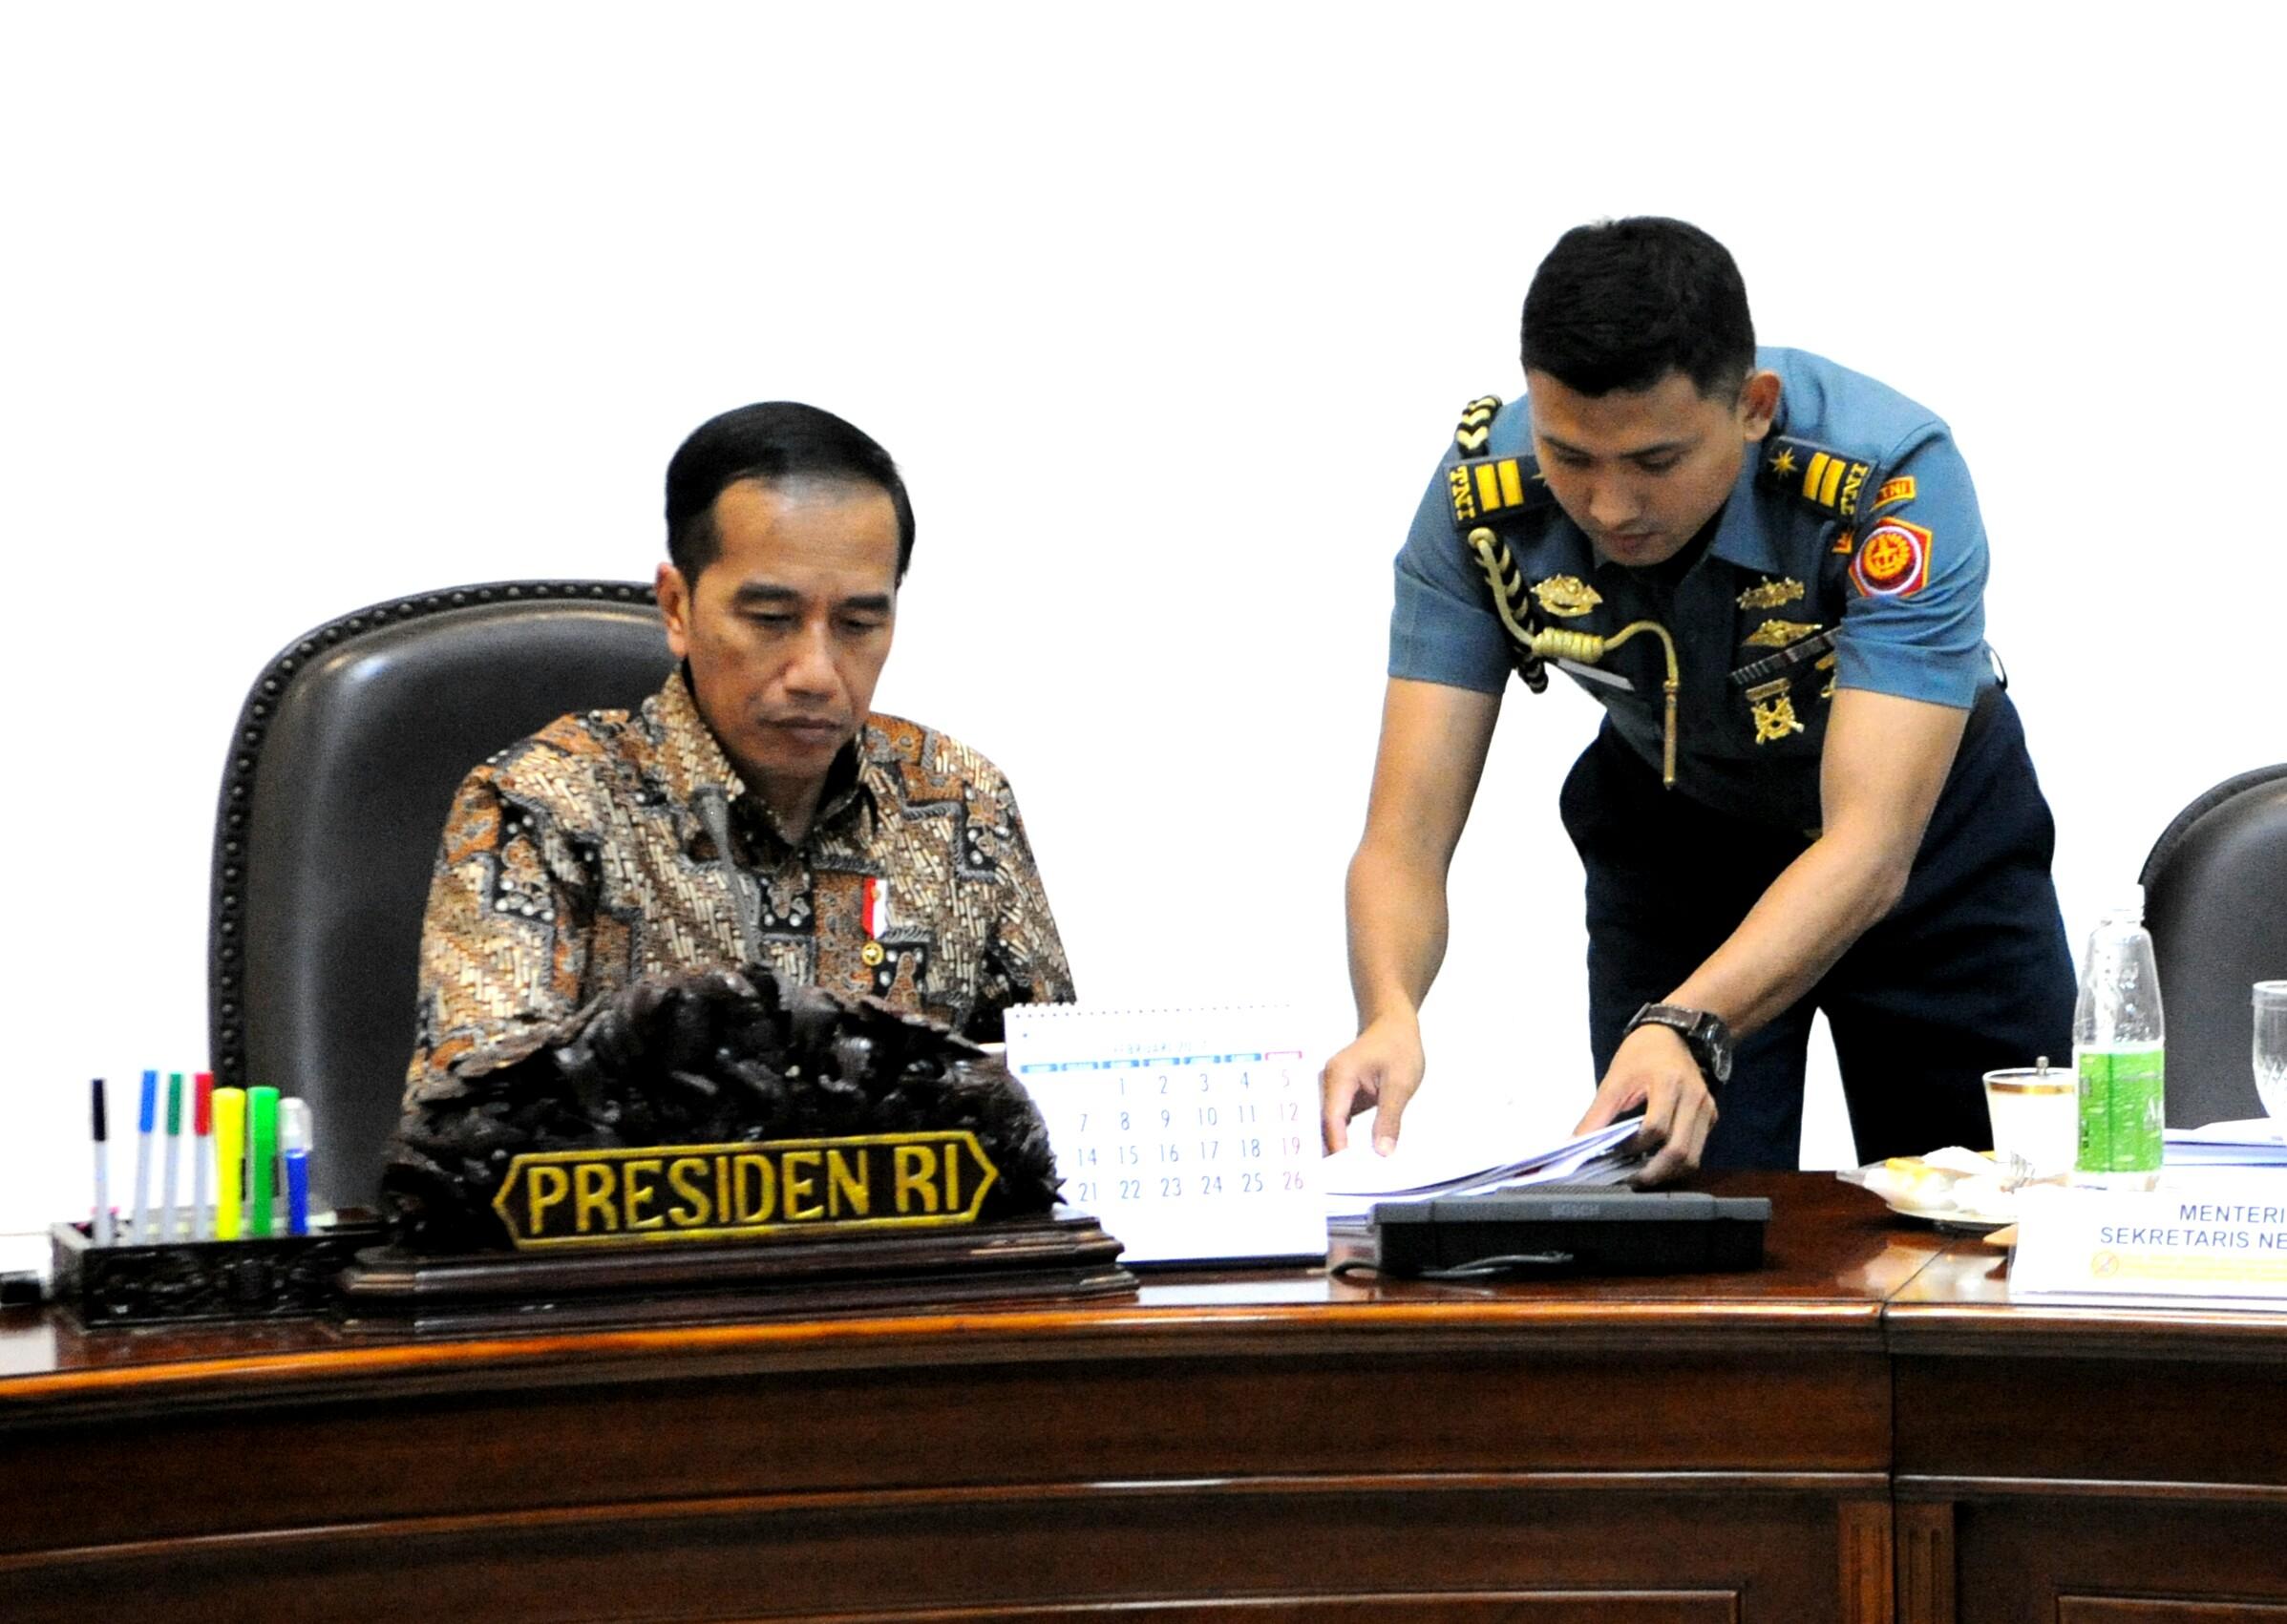 Presiden Jokowi bersiap memimpin rapat terbatas membahas RUU Pertanahan, di Kantor Presiden, Jakarta, Rabu (22/3) sore. (Foto: Rahmat/Humas)